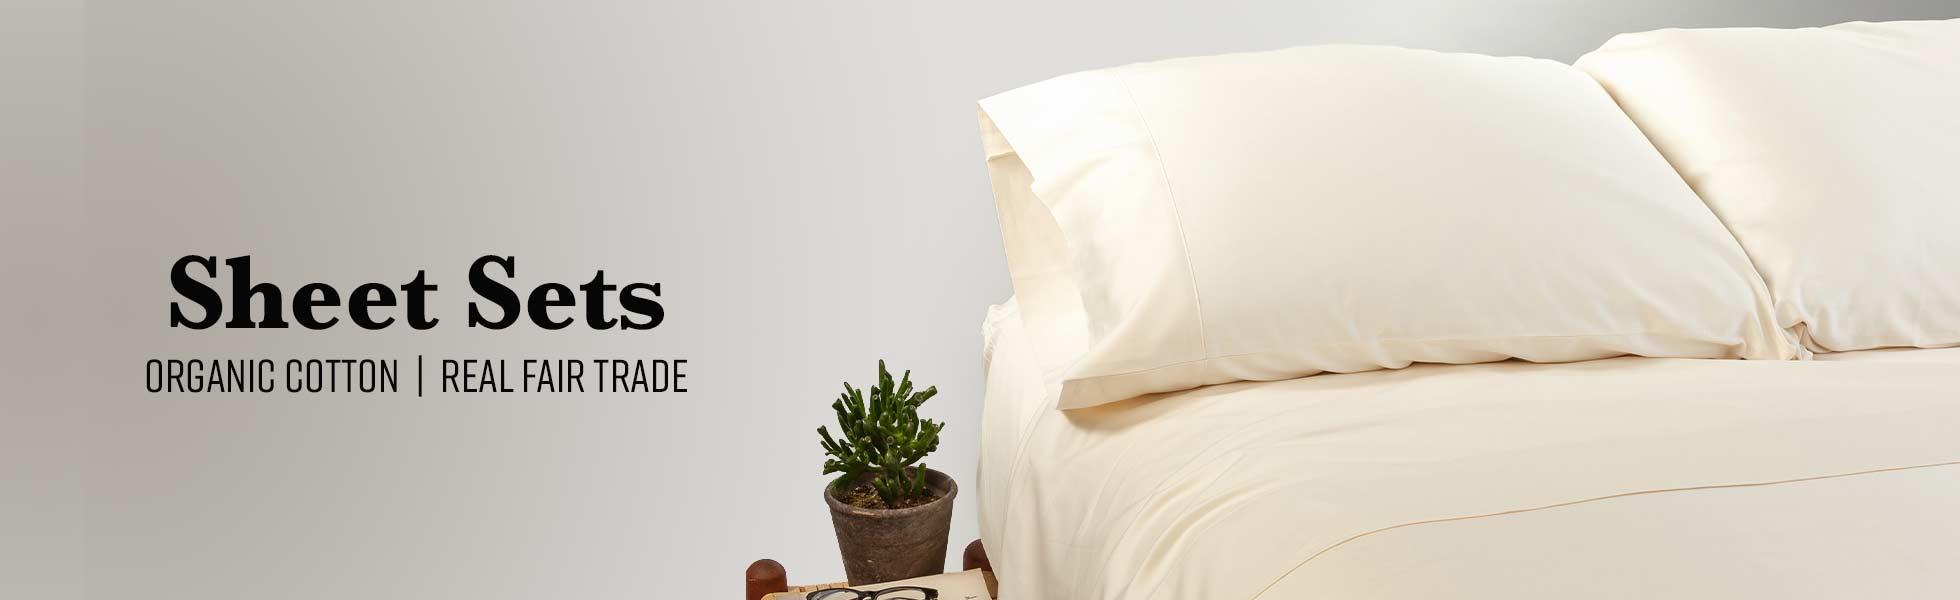 Organic Cotton Sheet Sets